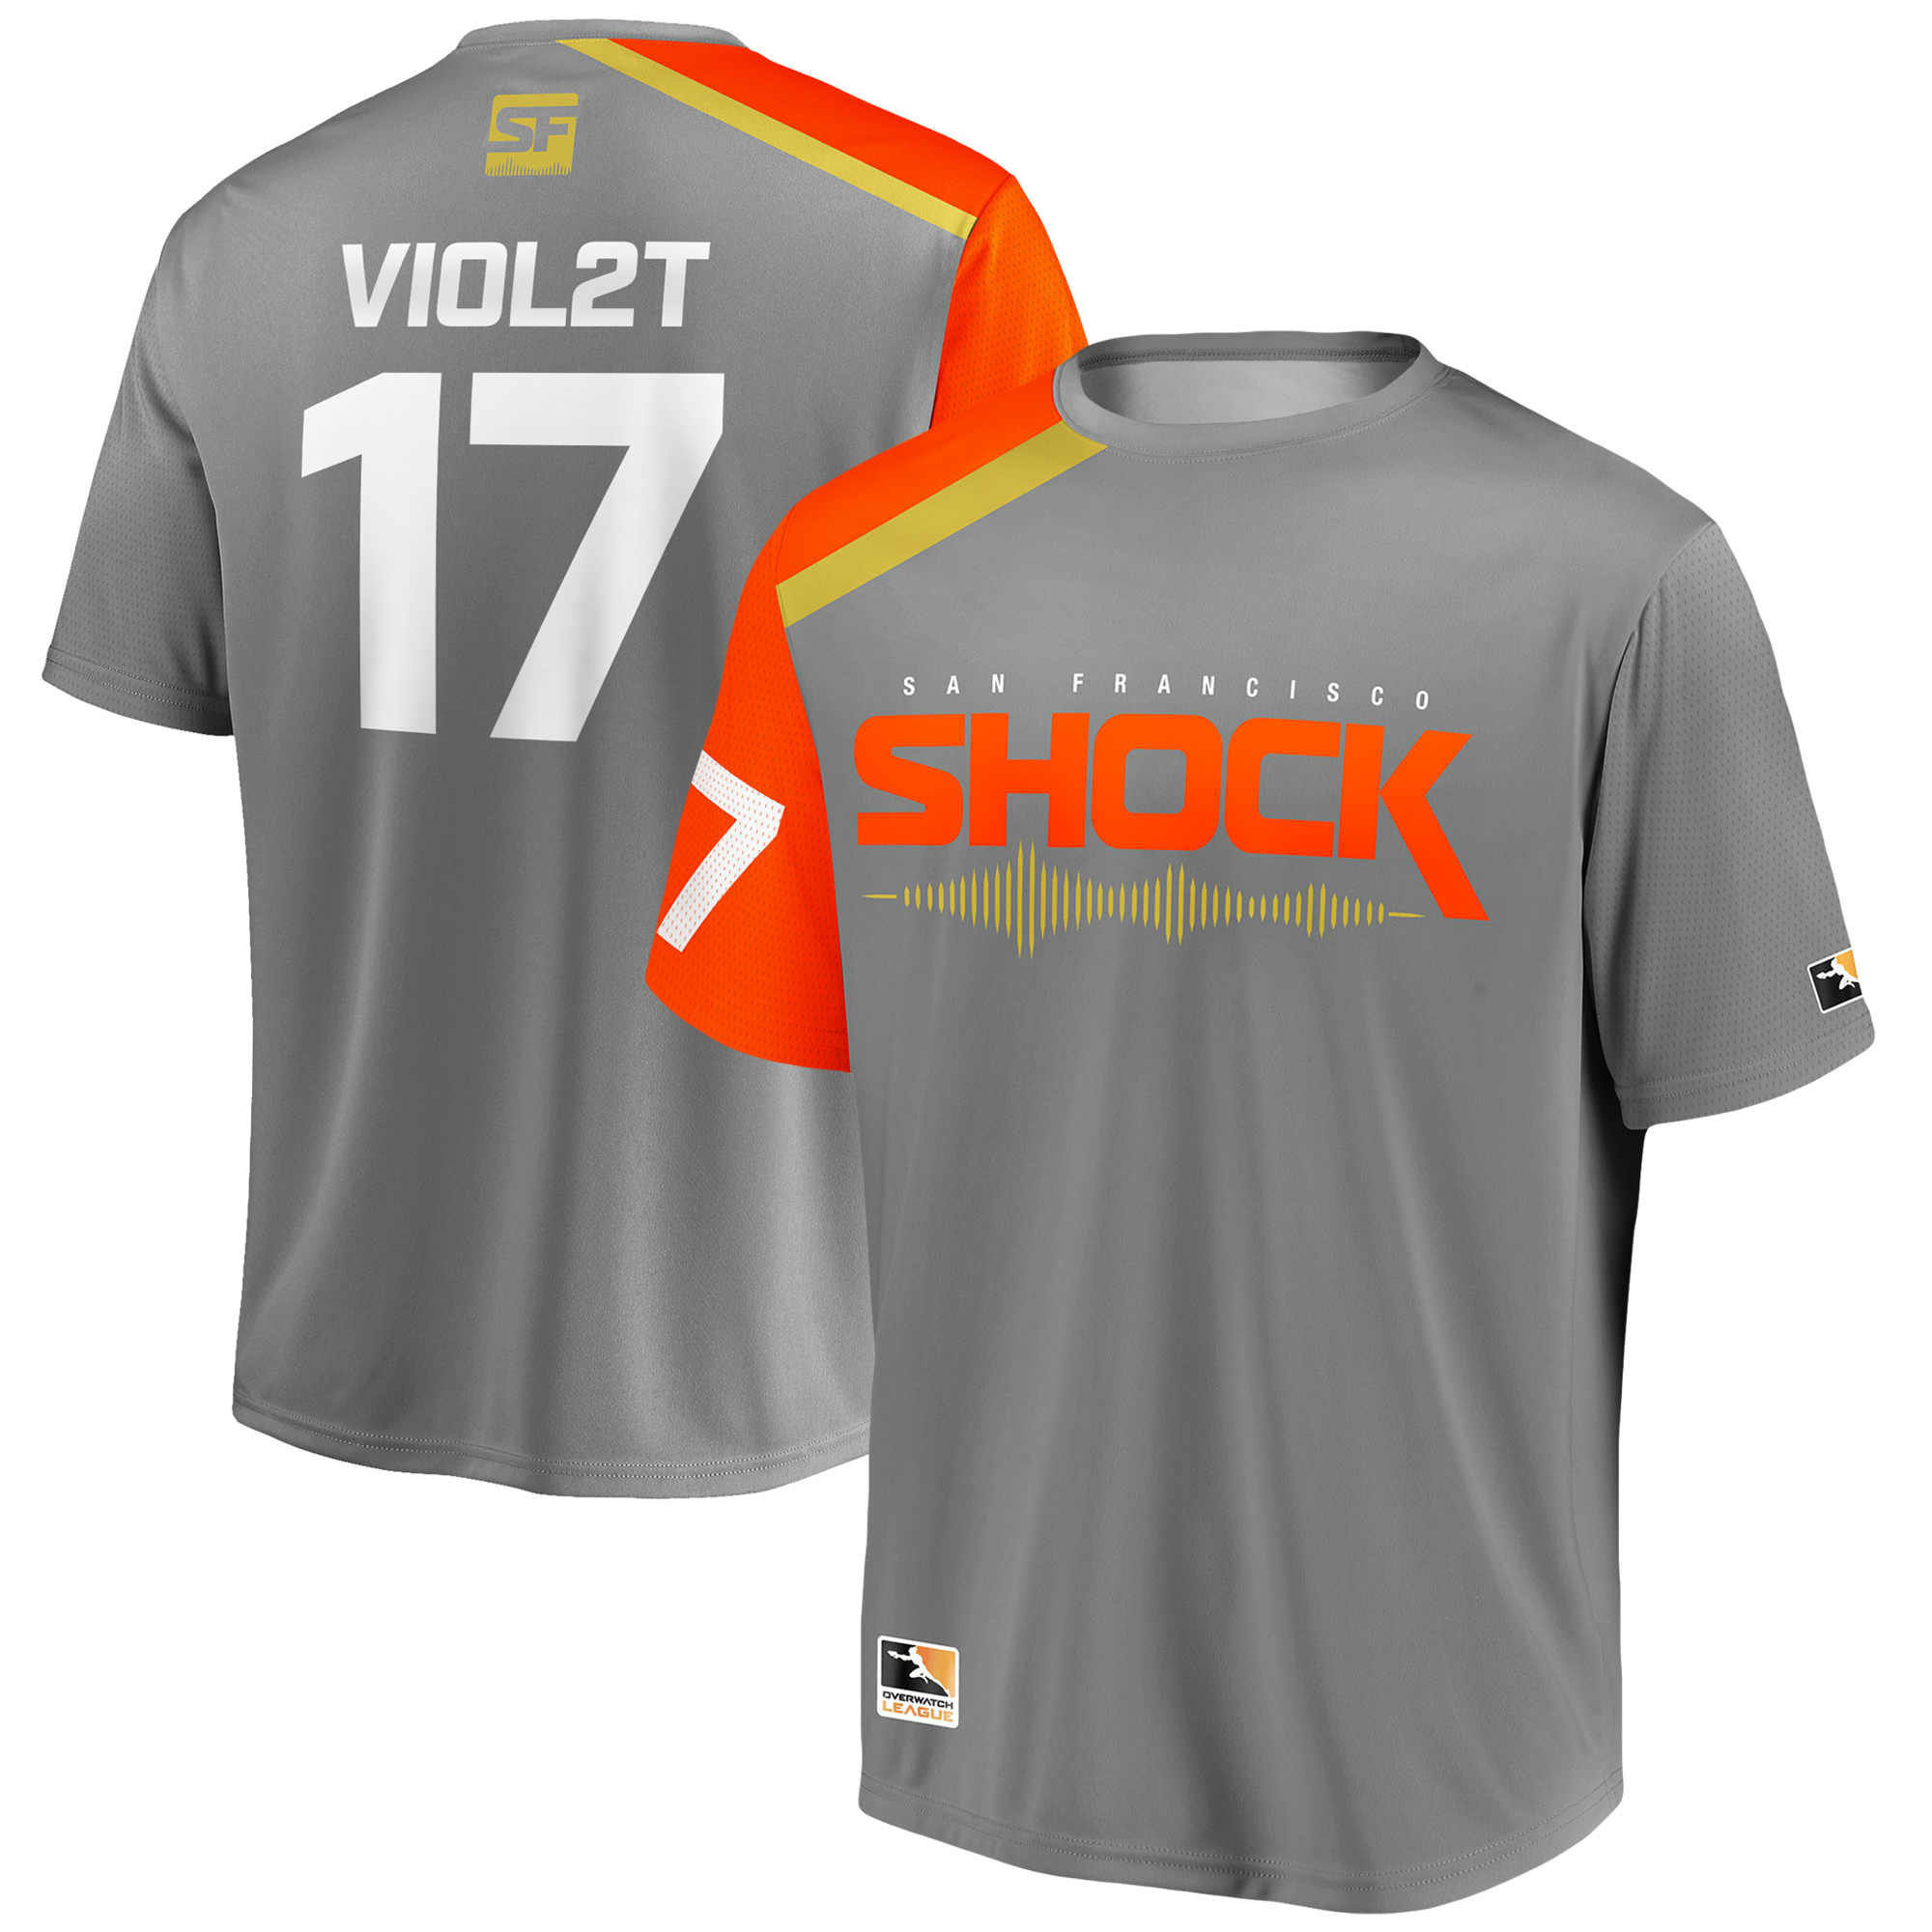 Viol2t San Francisco Shock Overwatch League Replica Home Jersey - Gray